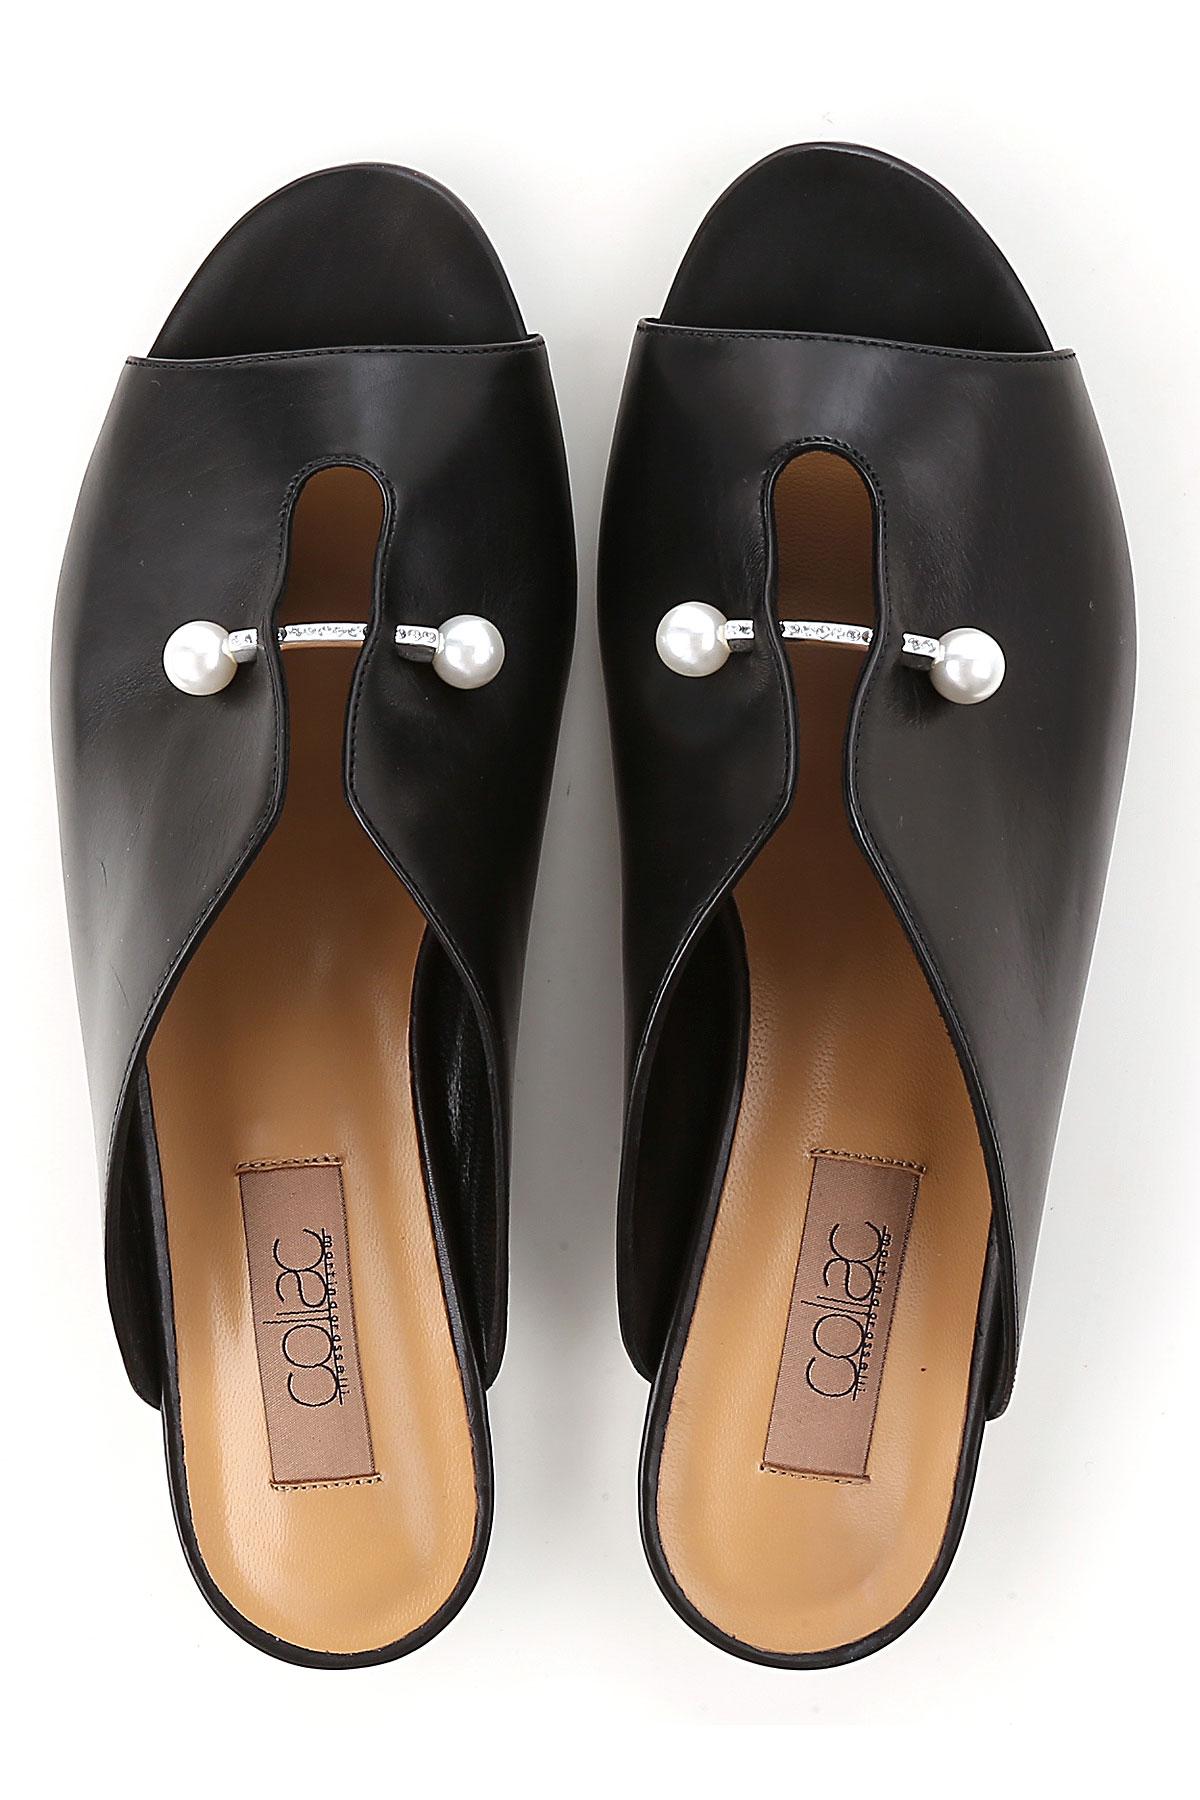 nbsp; Otoño 2018 invierno Mujer 19 Para Zapatos Coliac Negro Aqwz8S1n